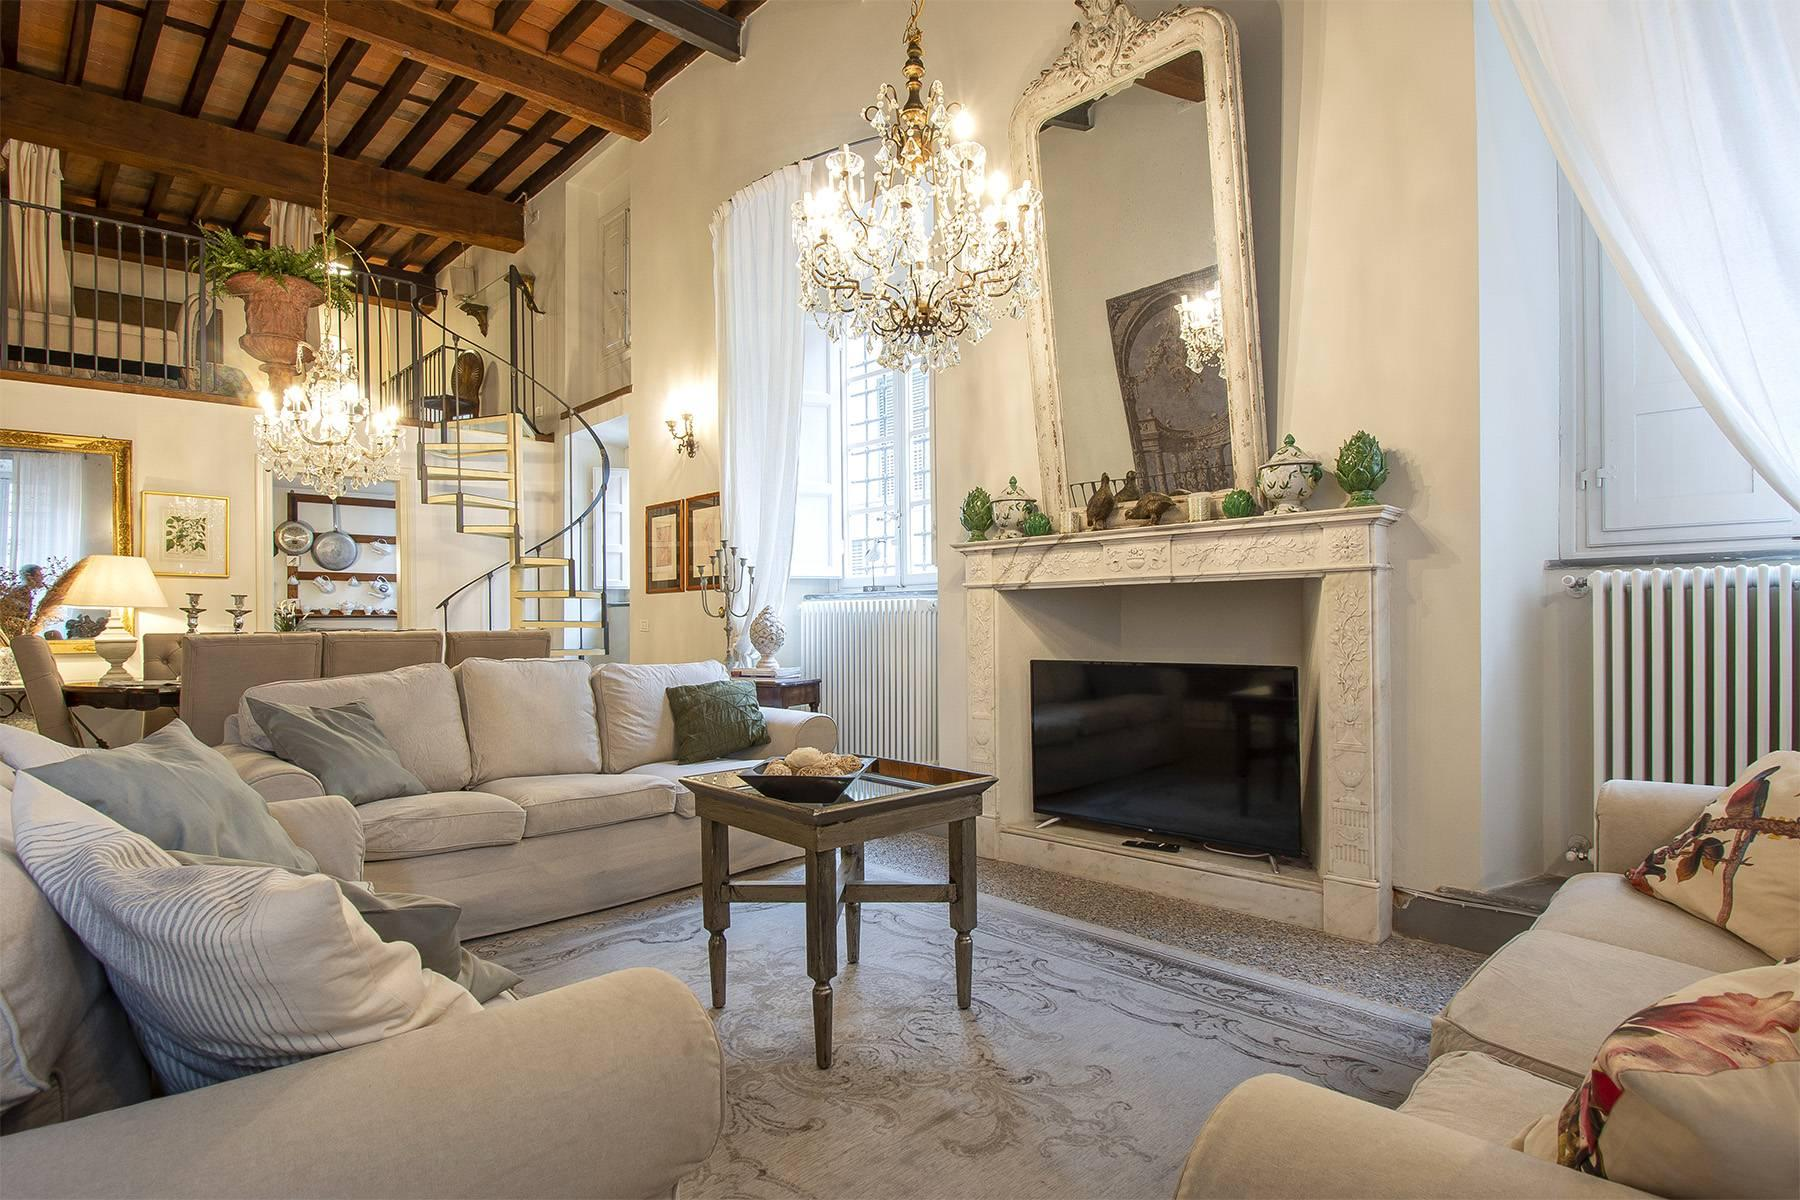 Appartement exclusif au coeur de Lucca - 3